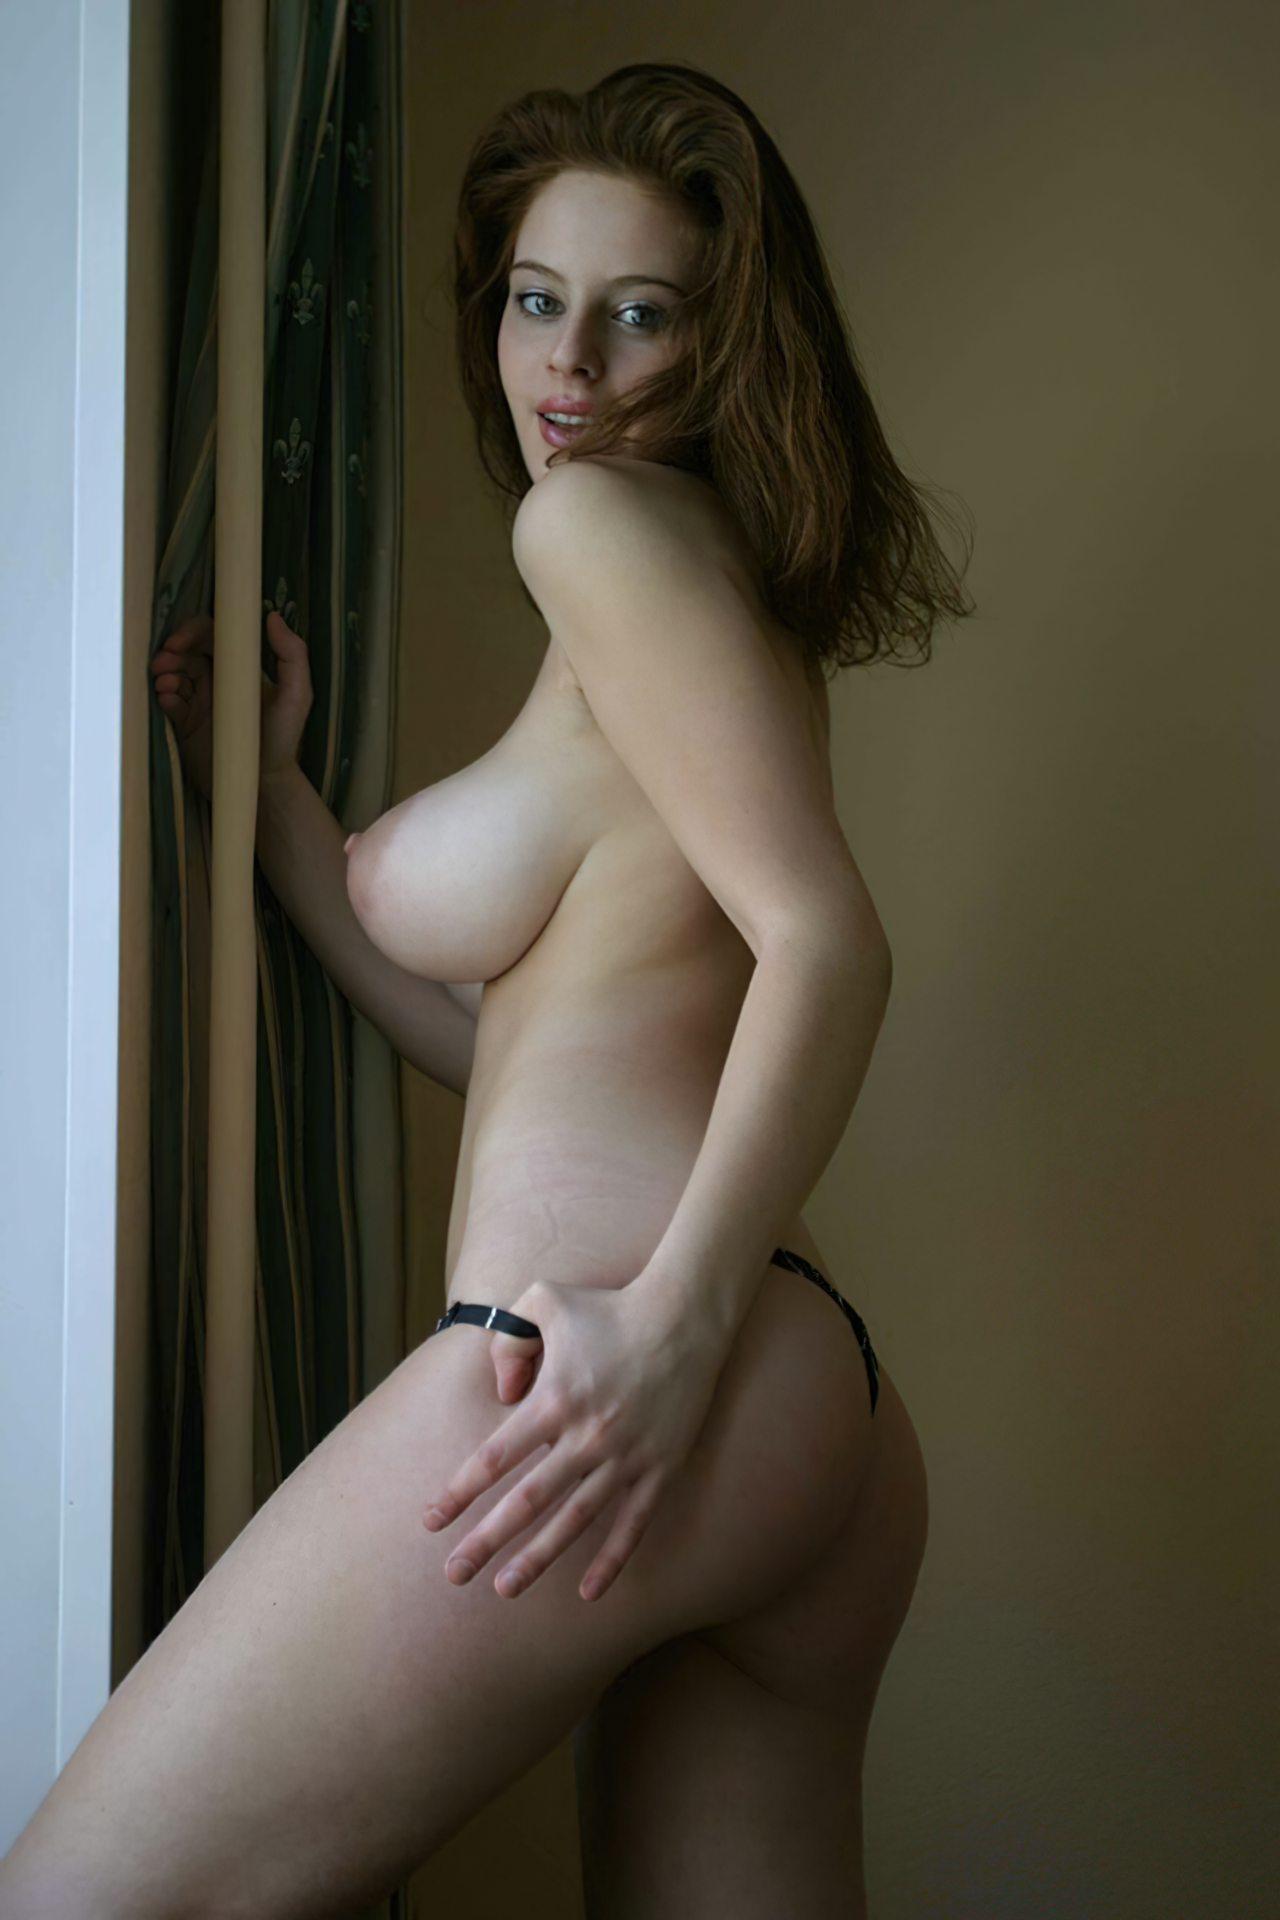 Fotos de Mulheres (41)